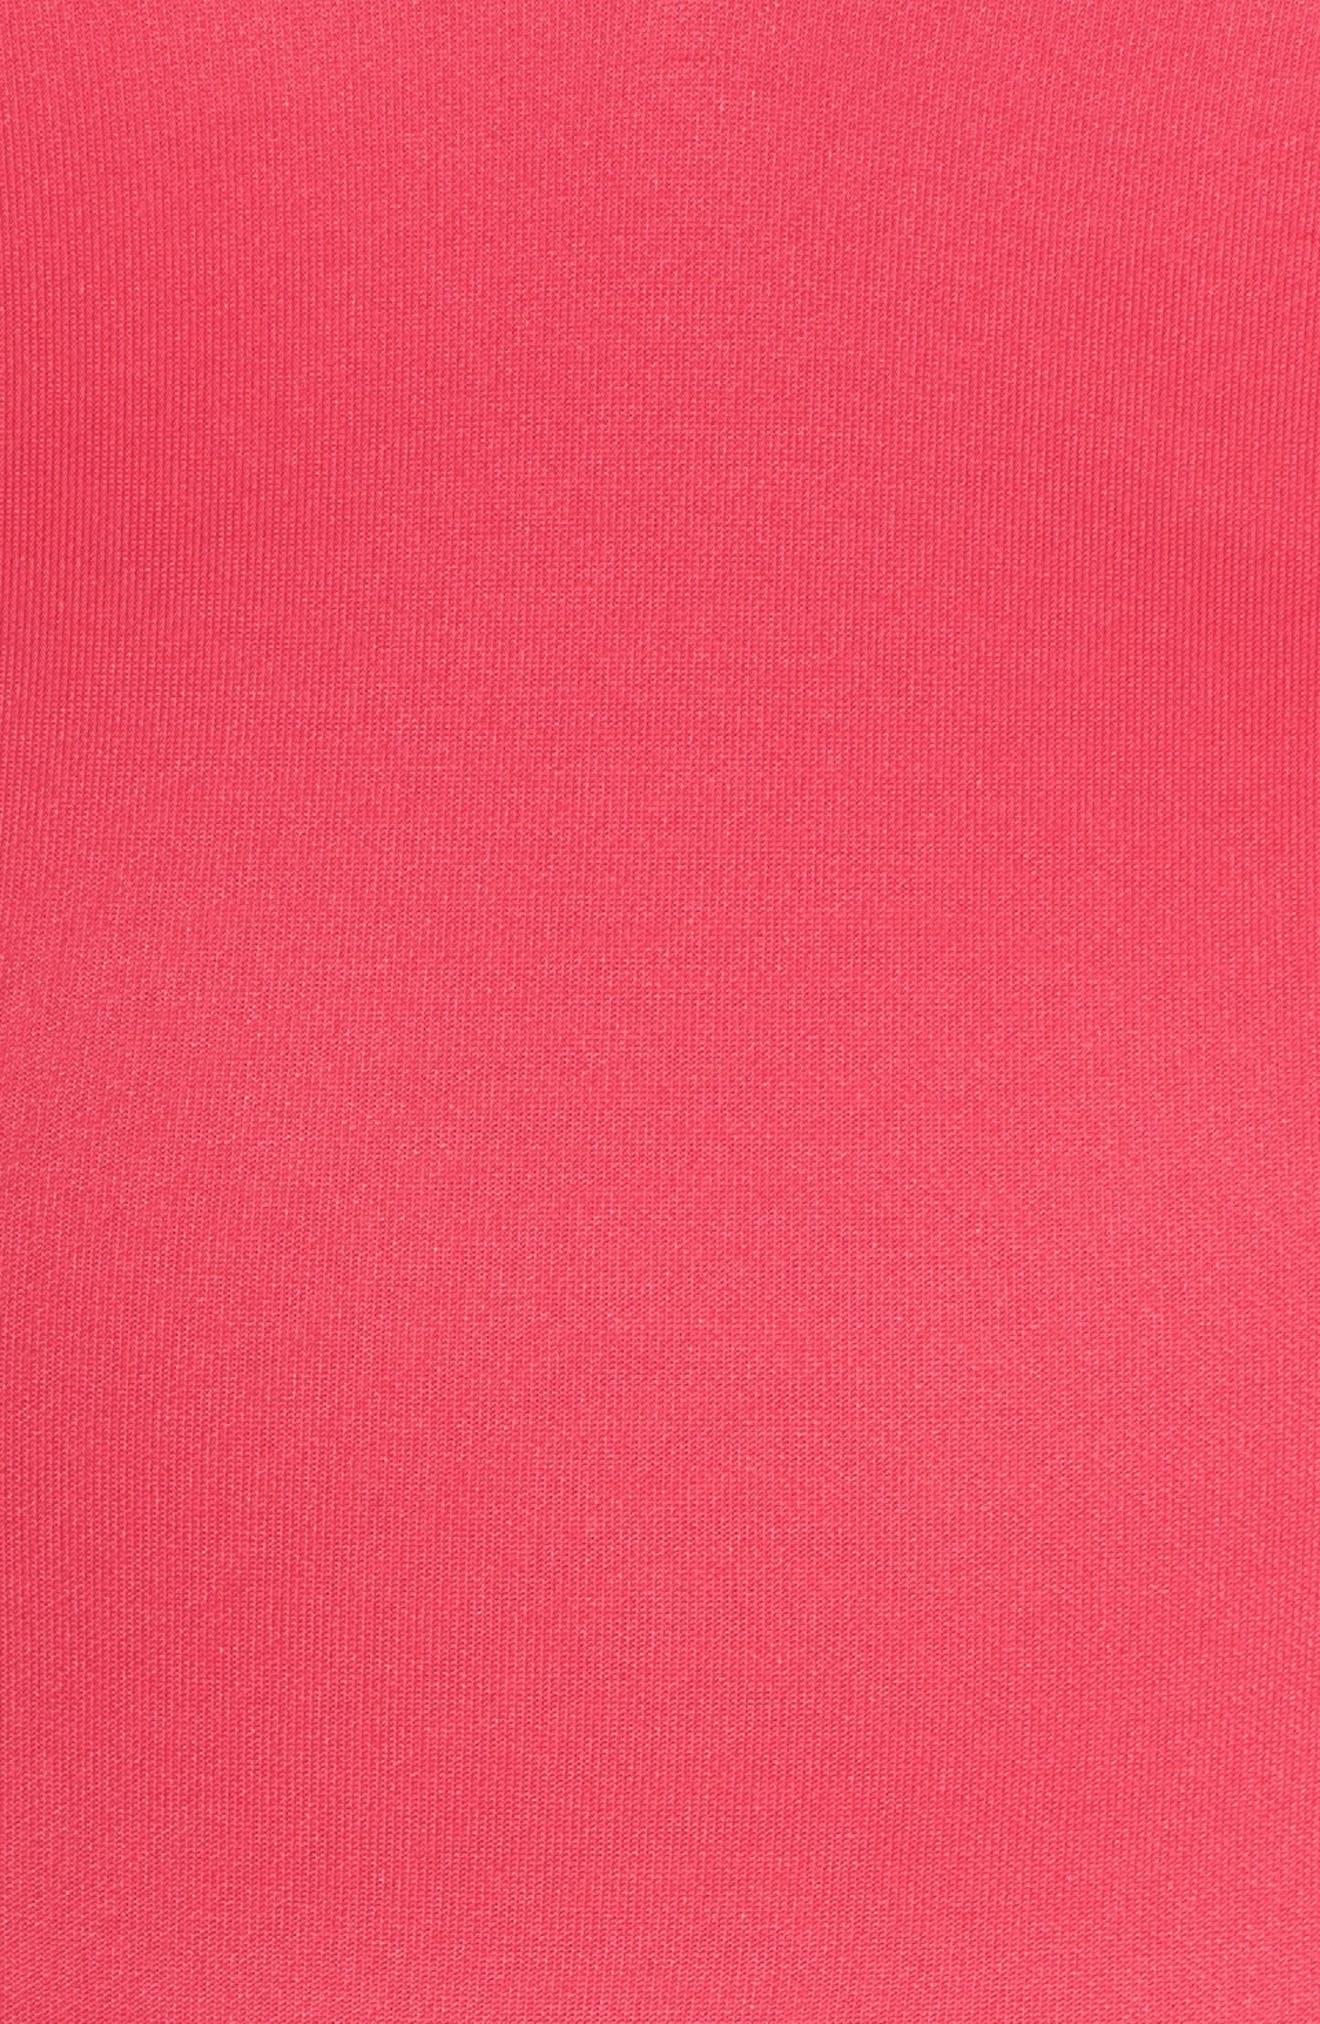 Lace Back Scuba Dress,                             Alternate thumbnail 5, color,                             Hot Pink/ Black